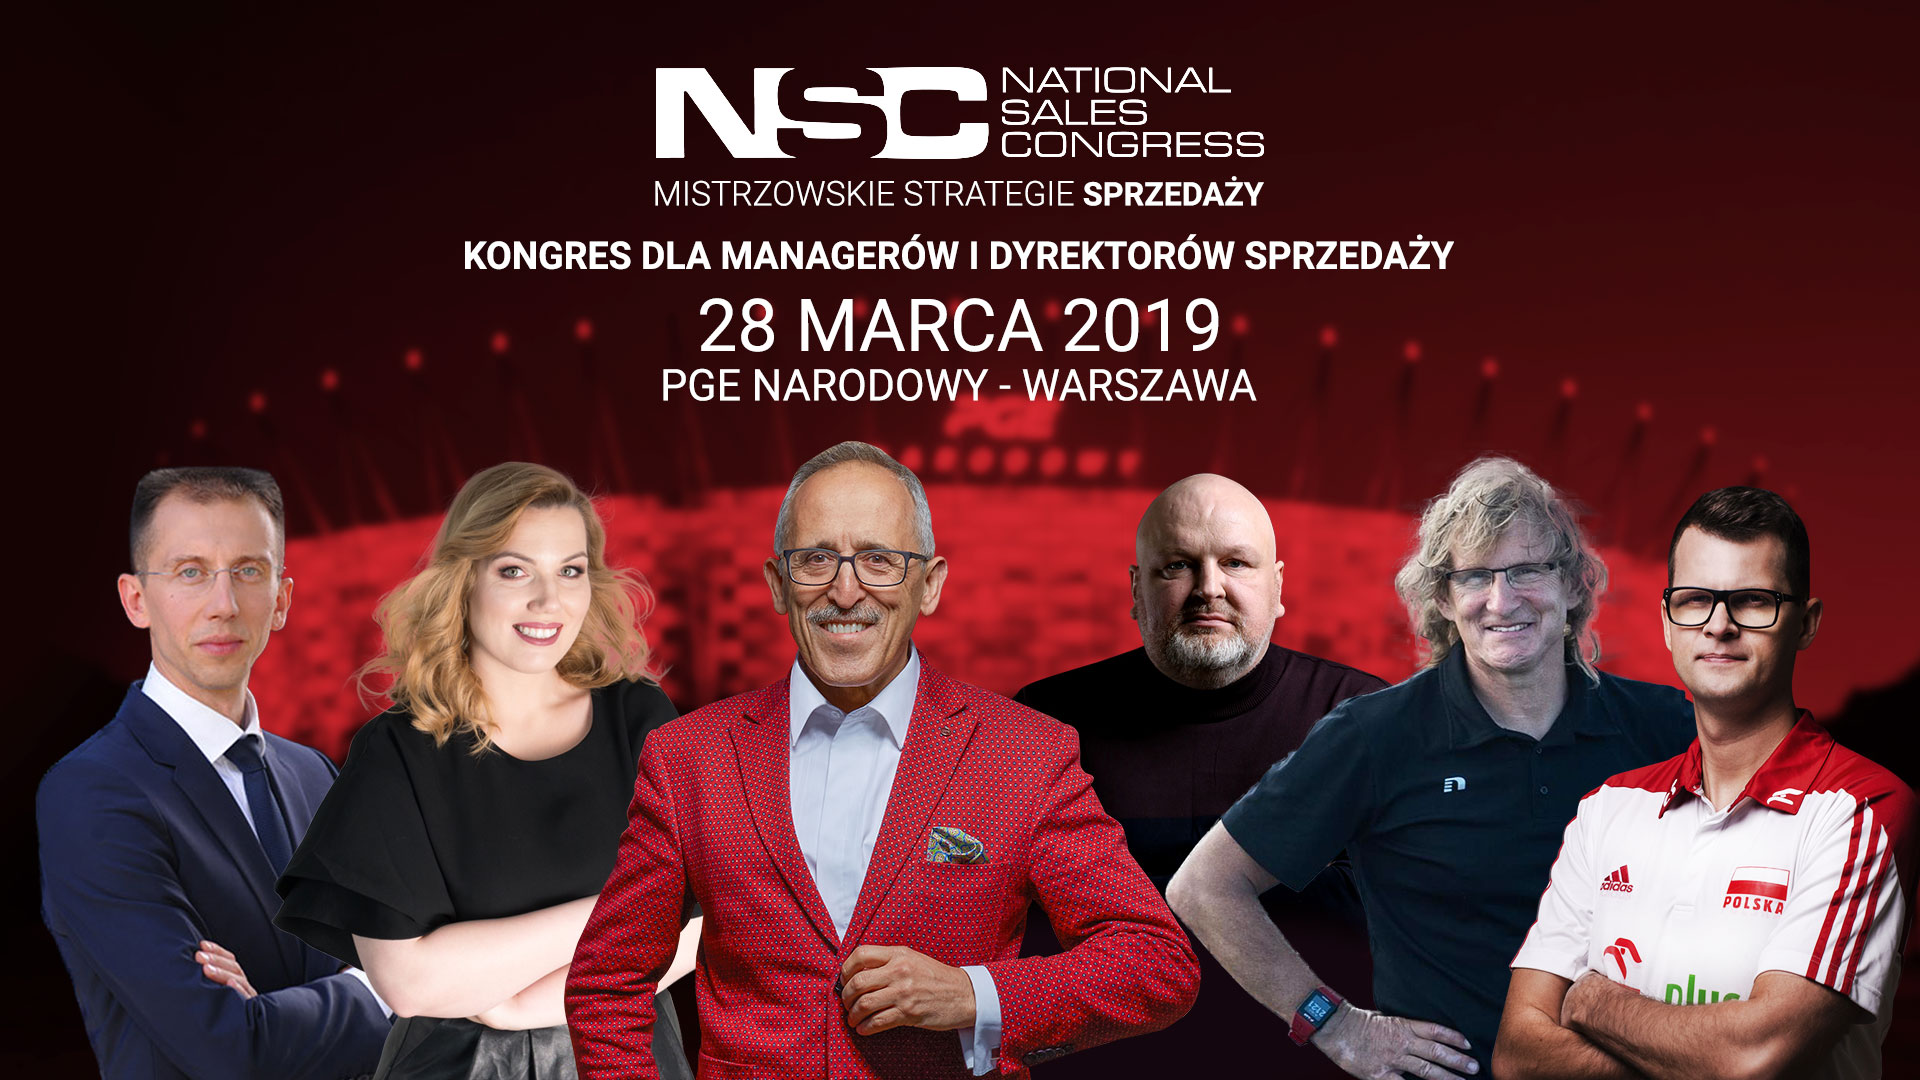 National Sales Congress